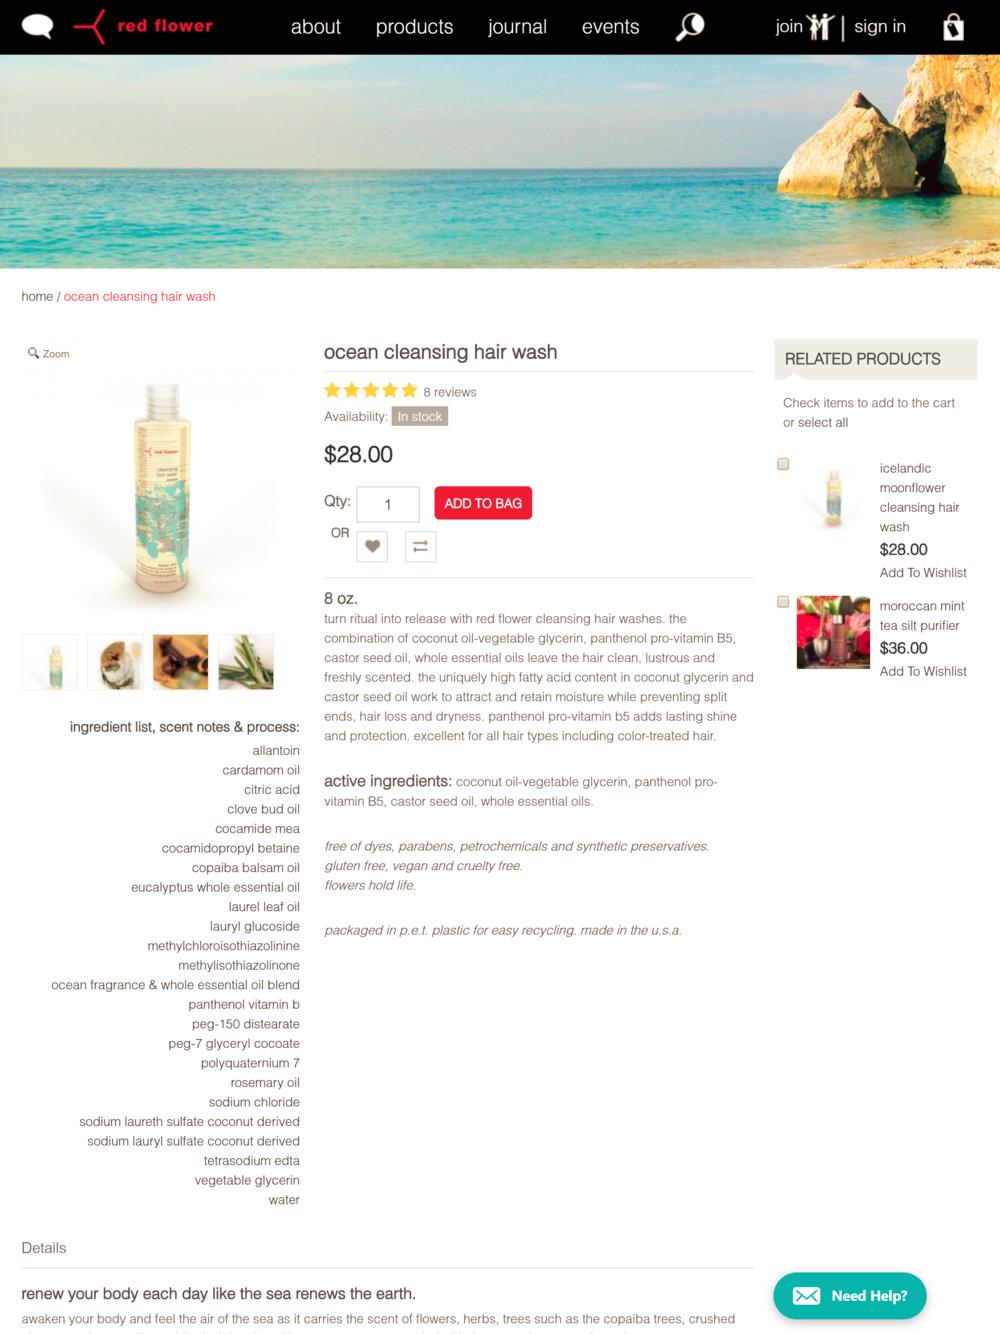 redflower.com_ocean-cleansing-hair-wash.html(iPad Pro).png